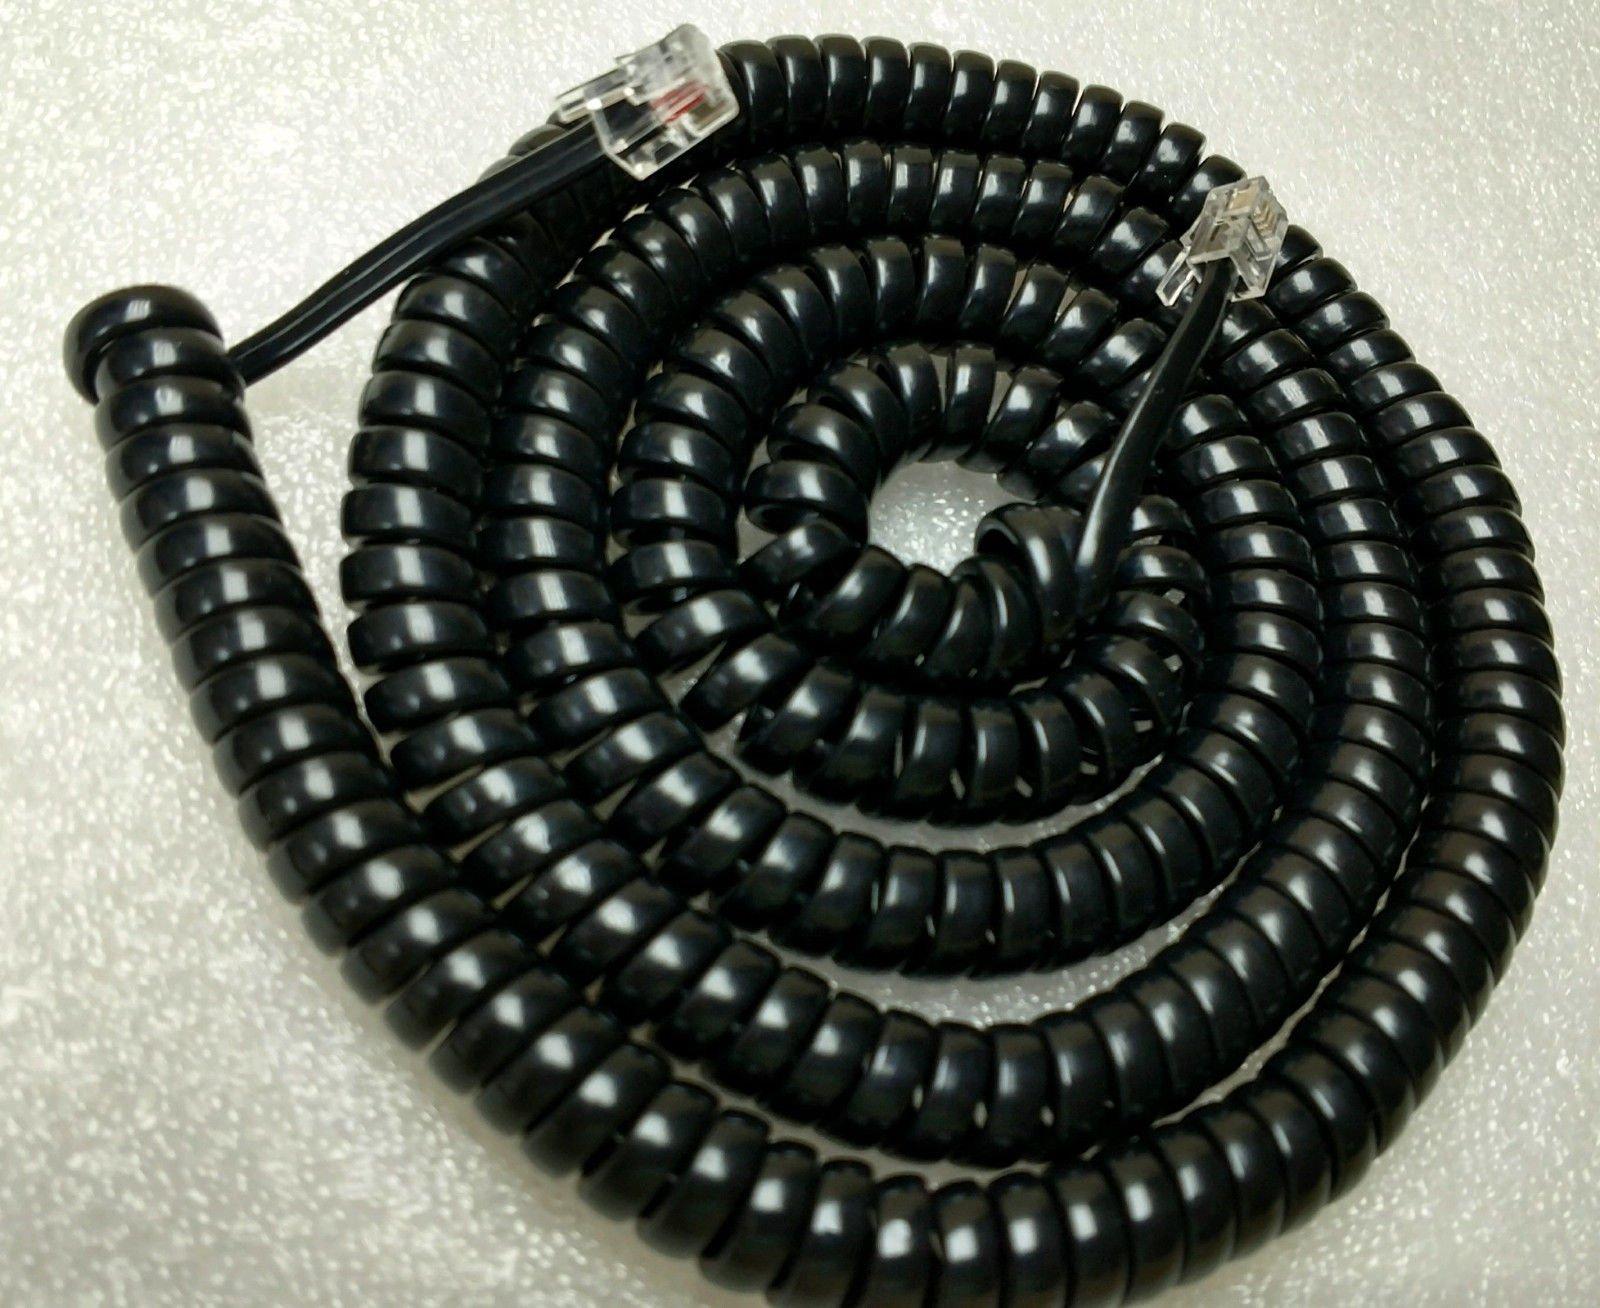 Lot of 5 Black 25' Ft Long Handset Phone Cords for RCA Executive Series 2 3 4 8 Line ViSys 25215 25260 25201 25204 25205 25214 25255 25270 2line 4line 8line (5-Pack) by DIY-BizPhones